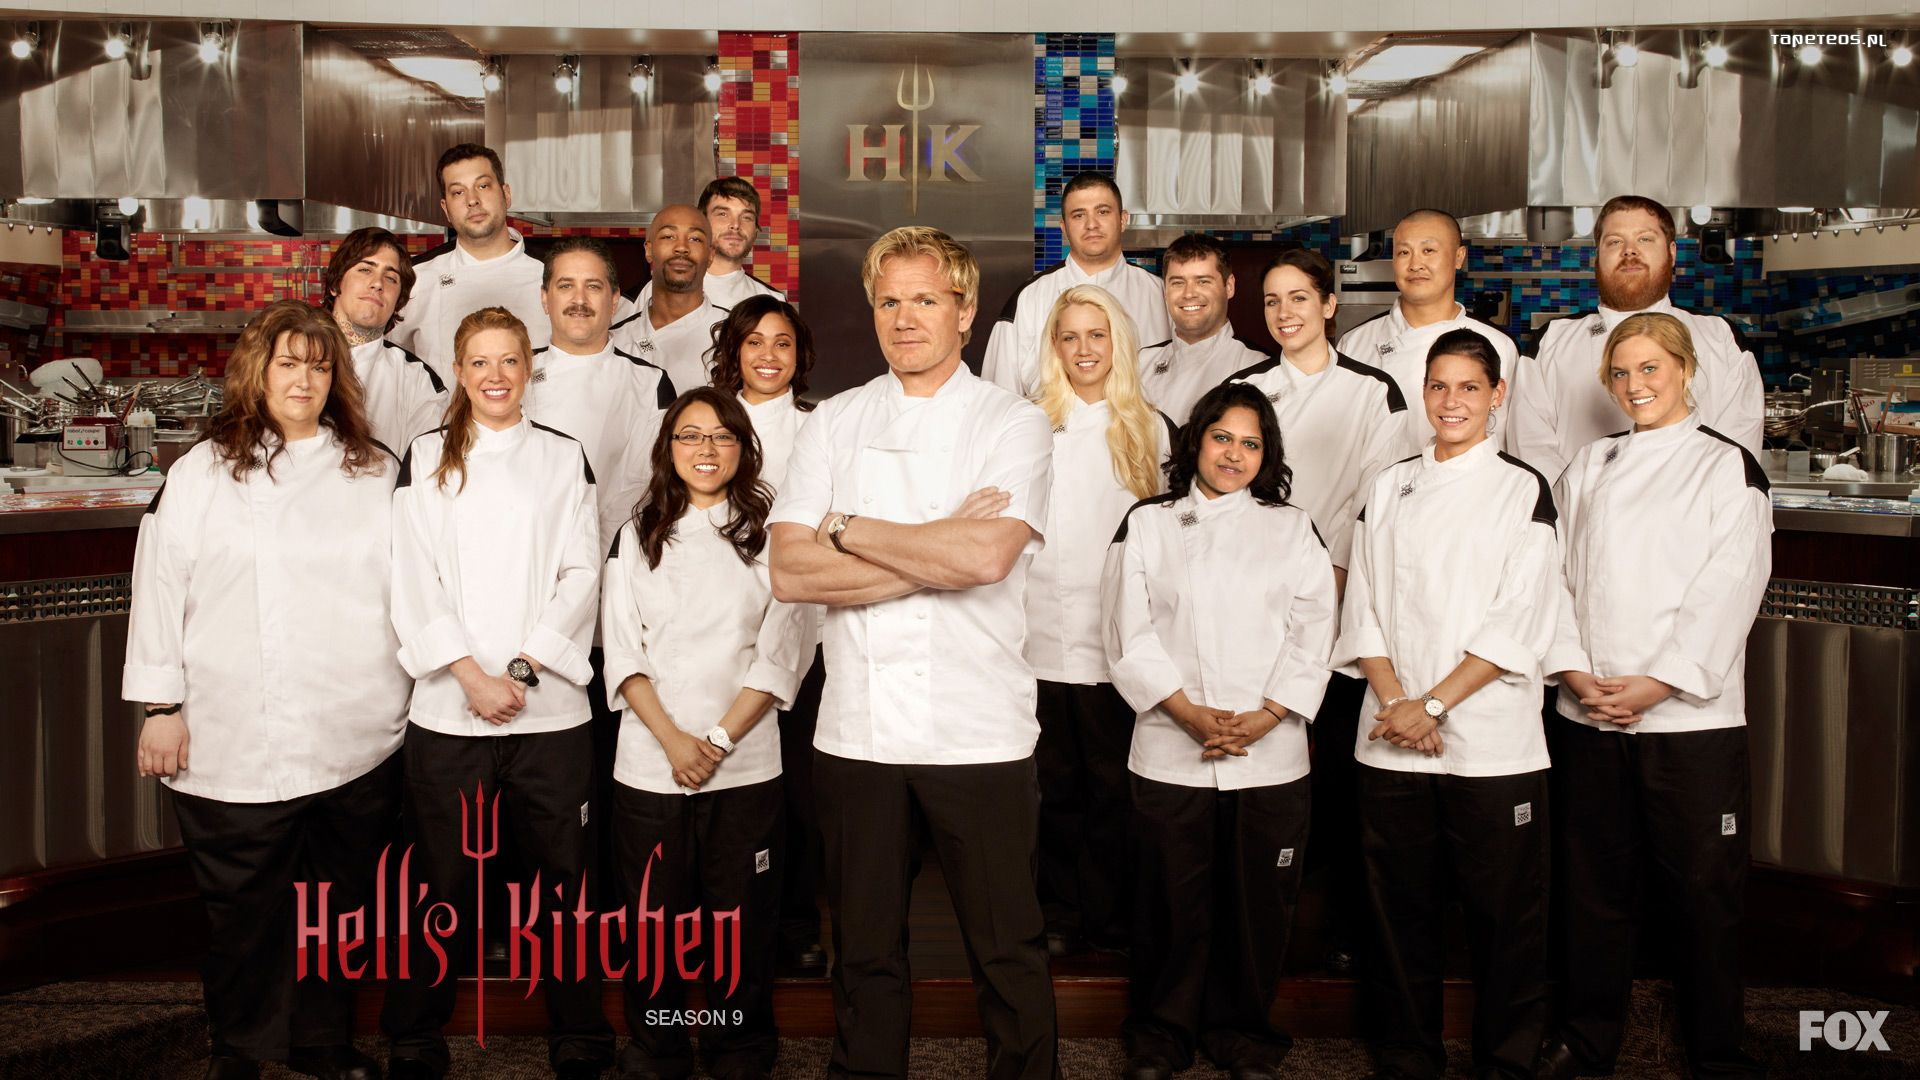 Hells kitchen piekielna kuchnia gordona ramsaya 010 sezon for Hell s kitchen season 16 cast